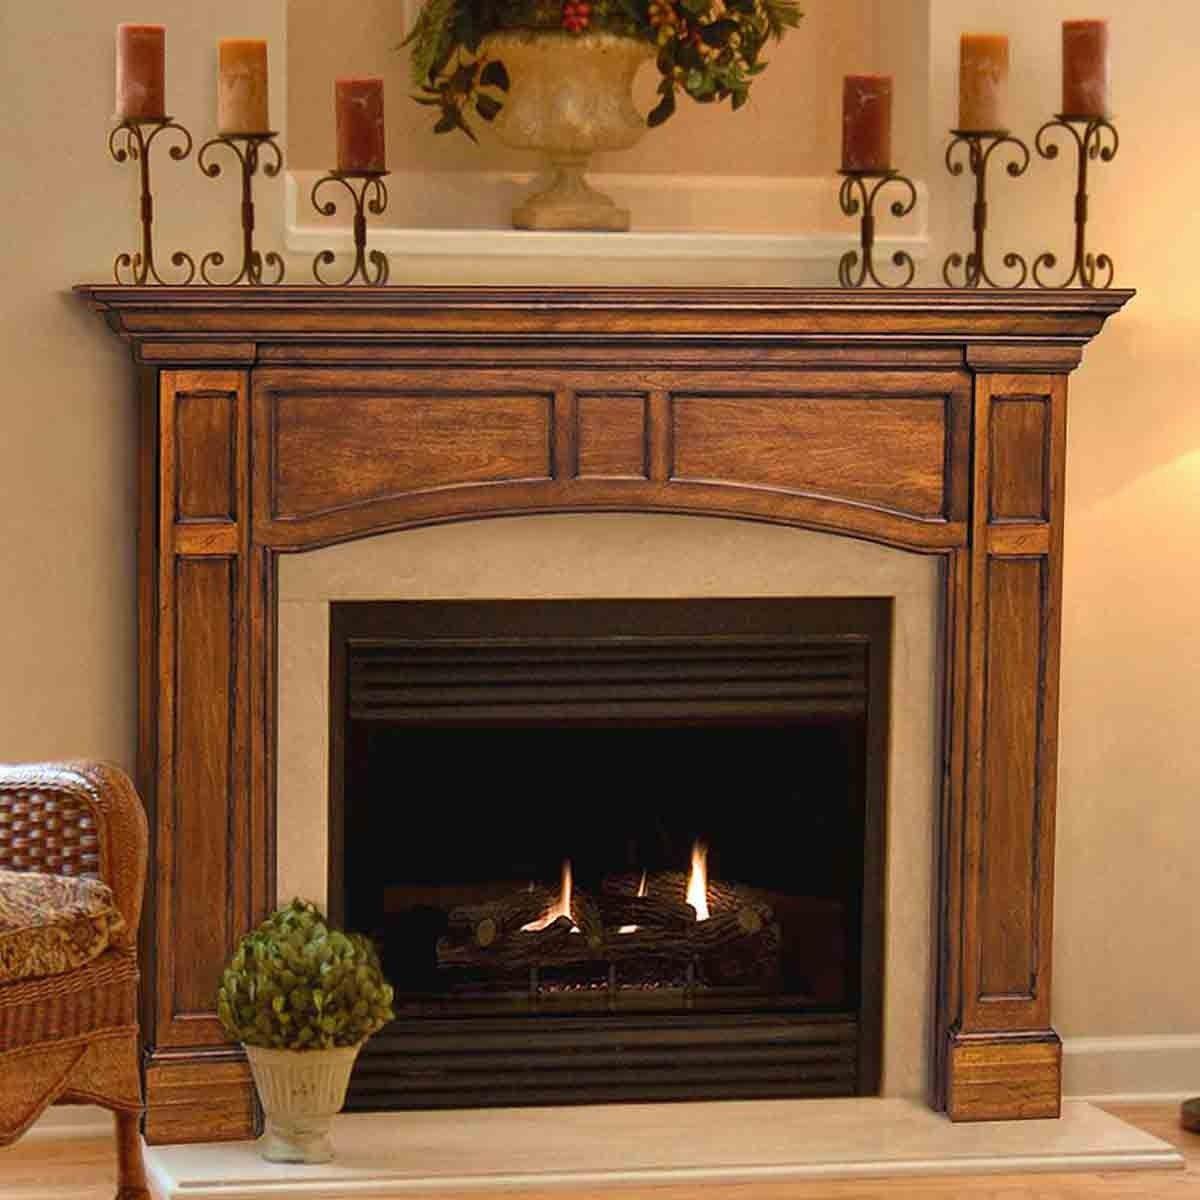 56 Vance Distressed Medium Oak Finished Fireplace Mantel By Pearl Mantels Fireplace Mantel Surrounds Wood Fireplace Surrounds Wood Fireplace Mantel